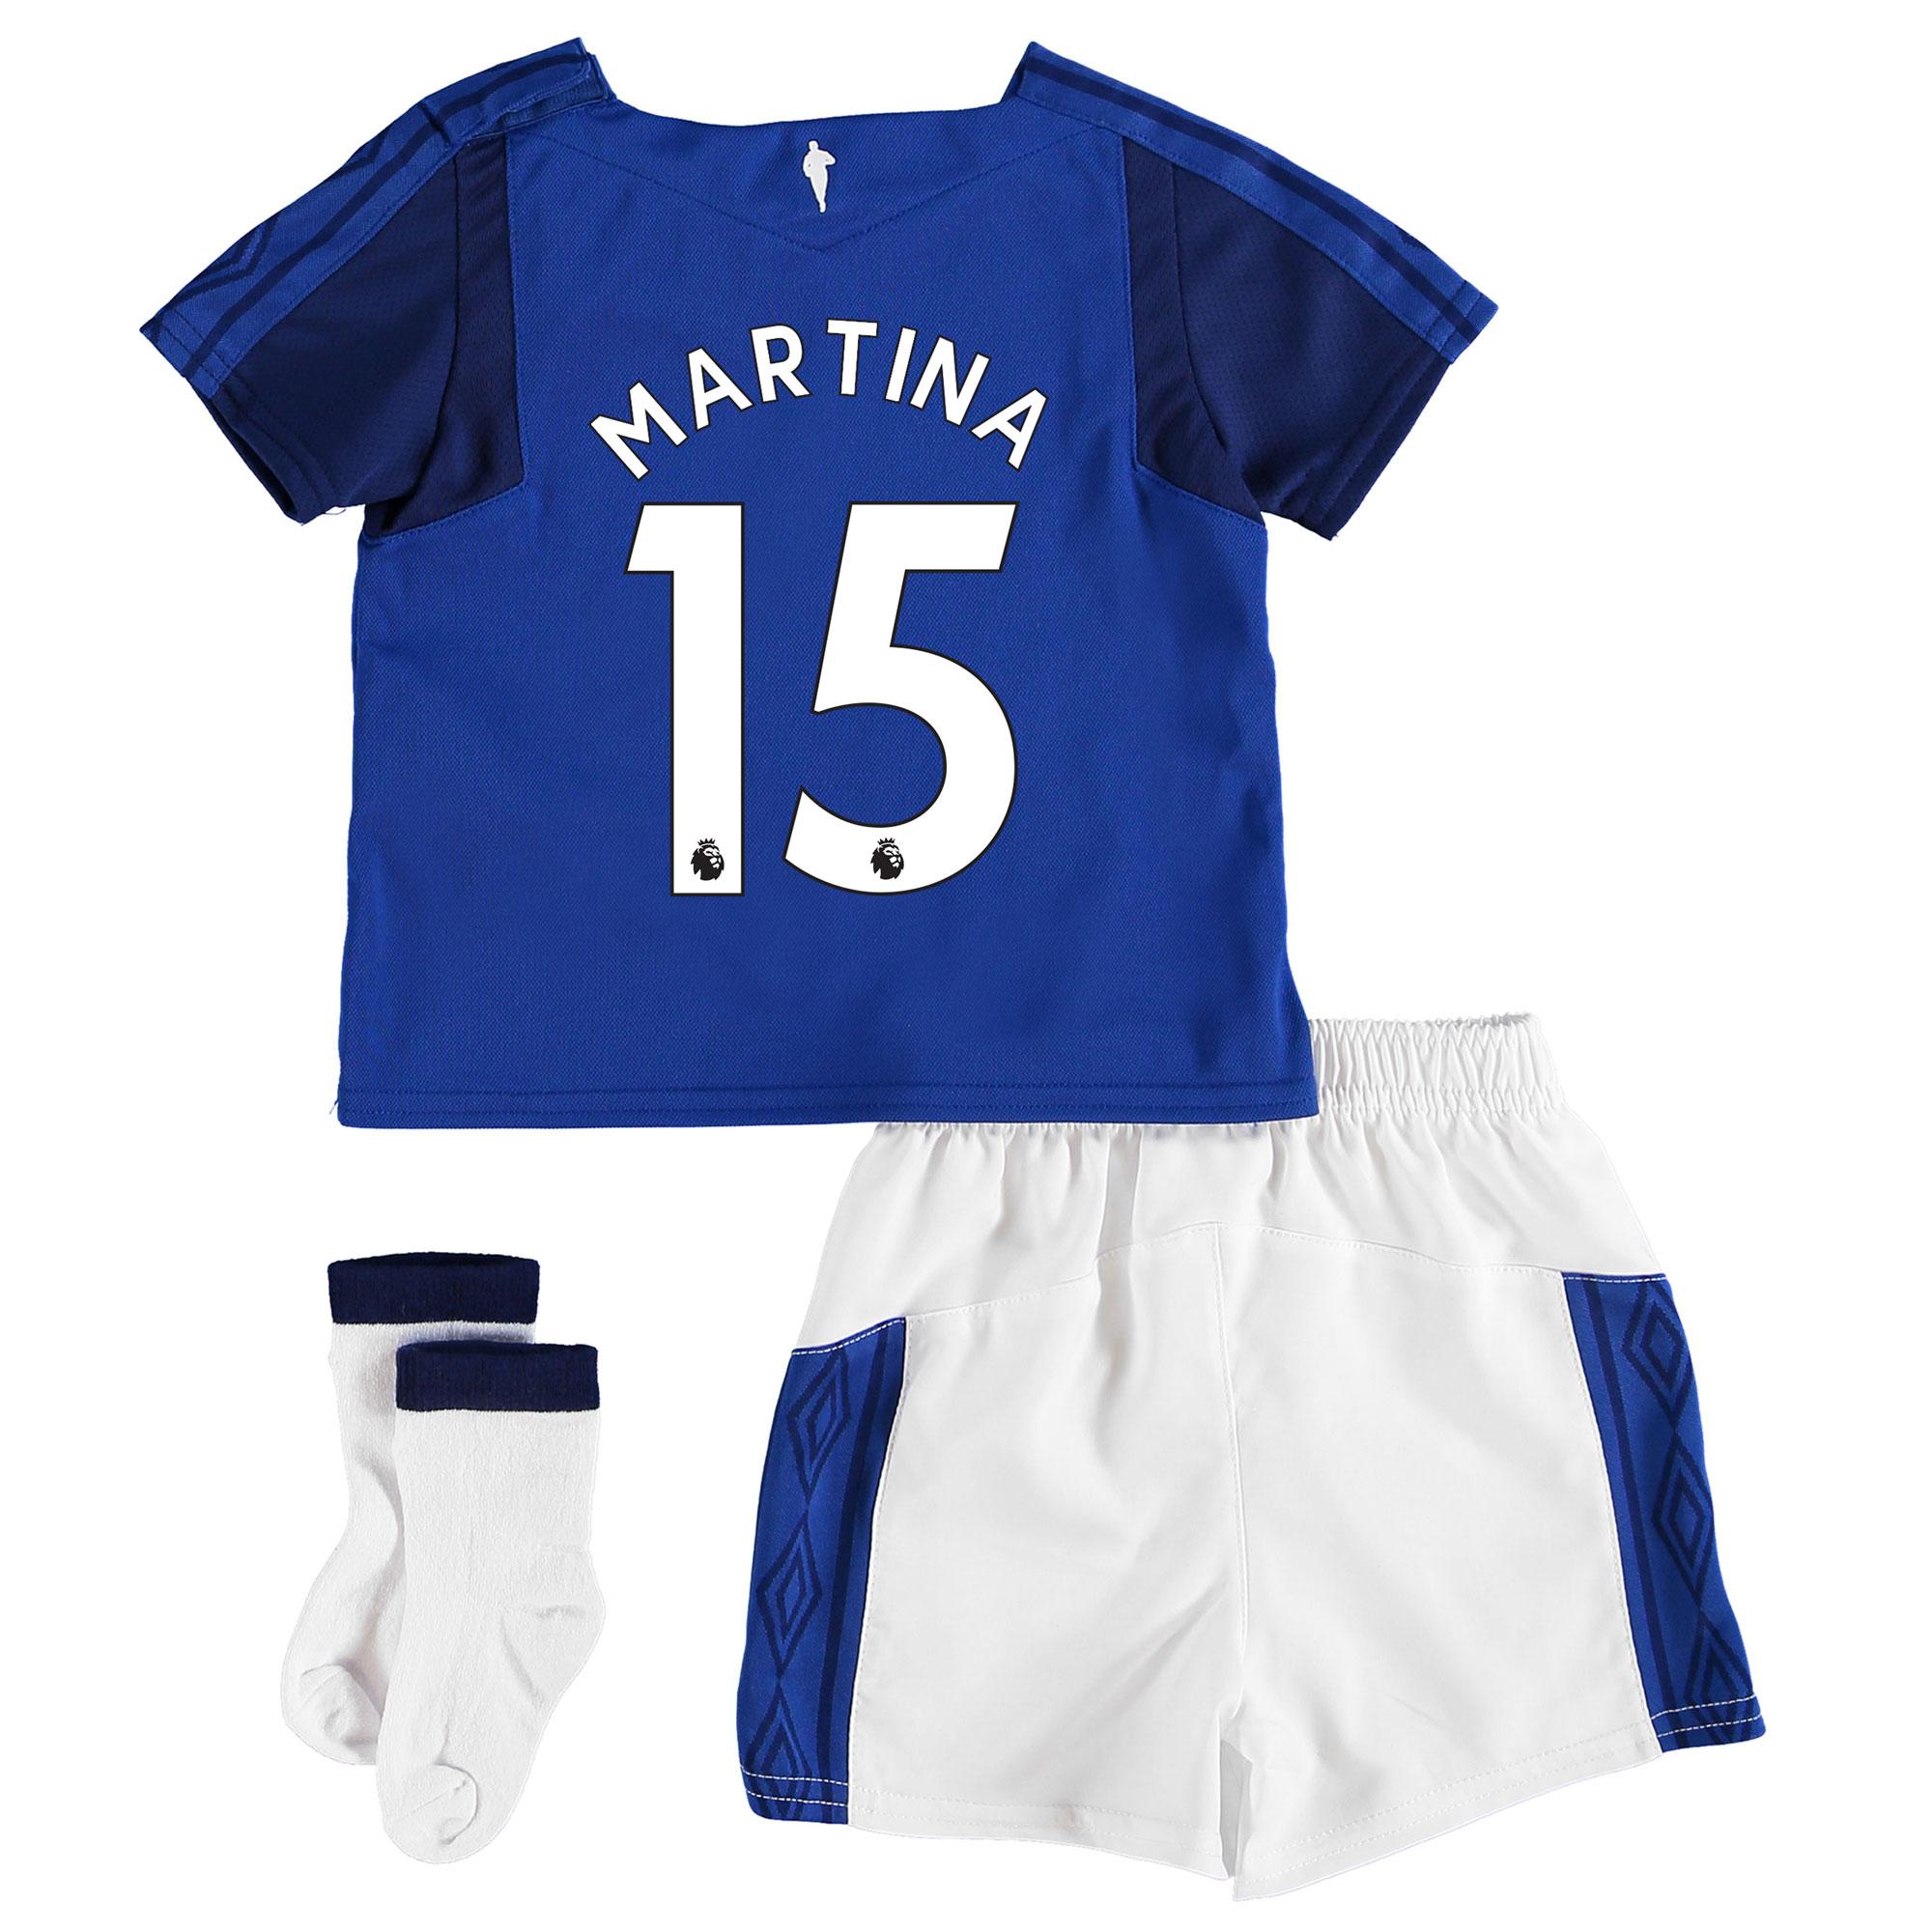 Everton Home Baby Kit 2017/18 with Martina 15 printing